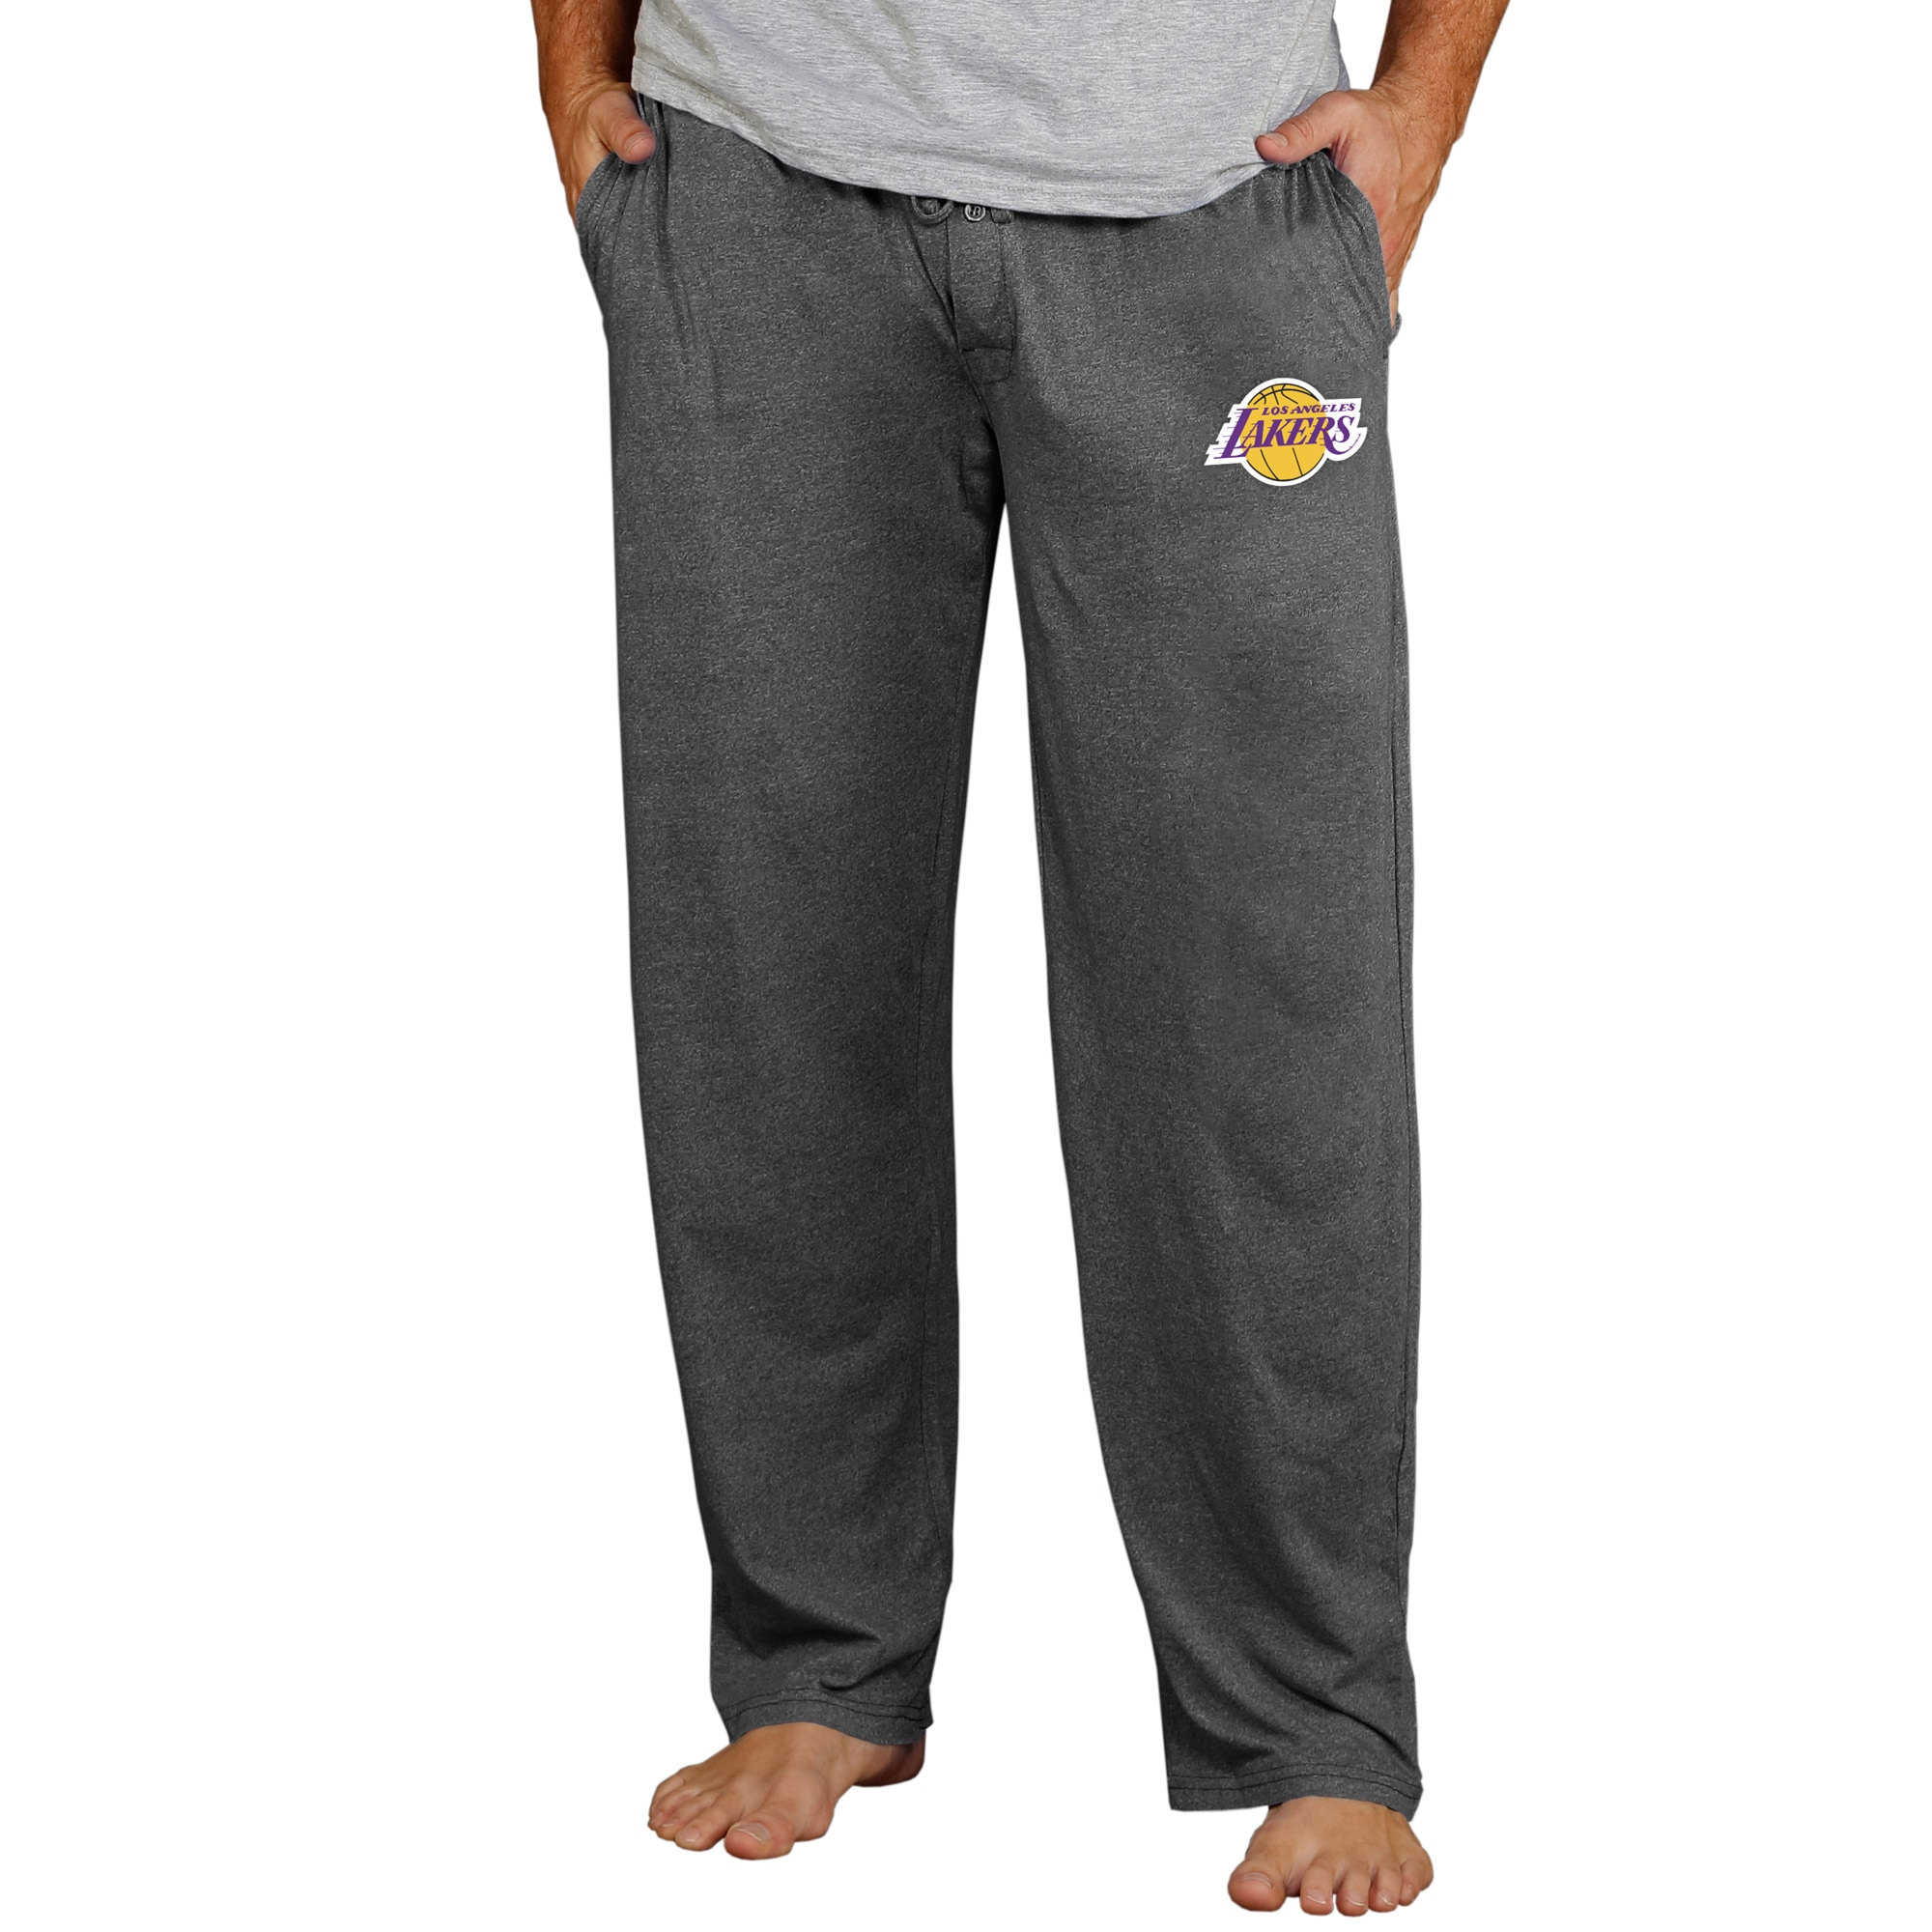 Los Angeles Lakers Concepts Sport Quest Knit Pants - Charcoal